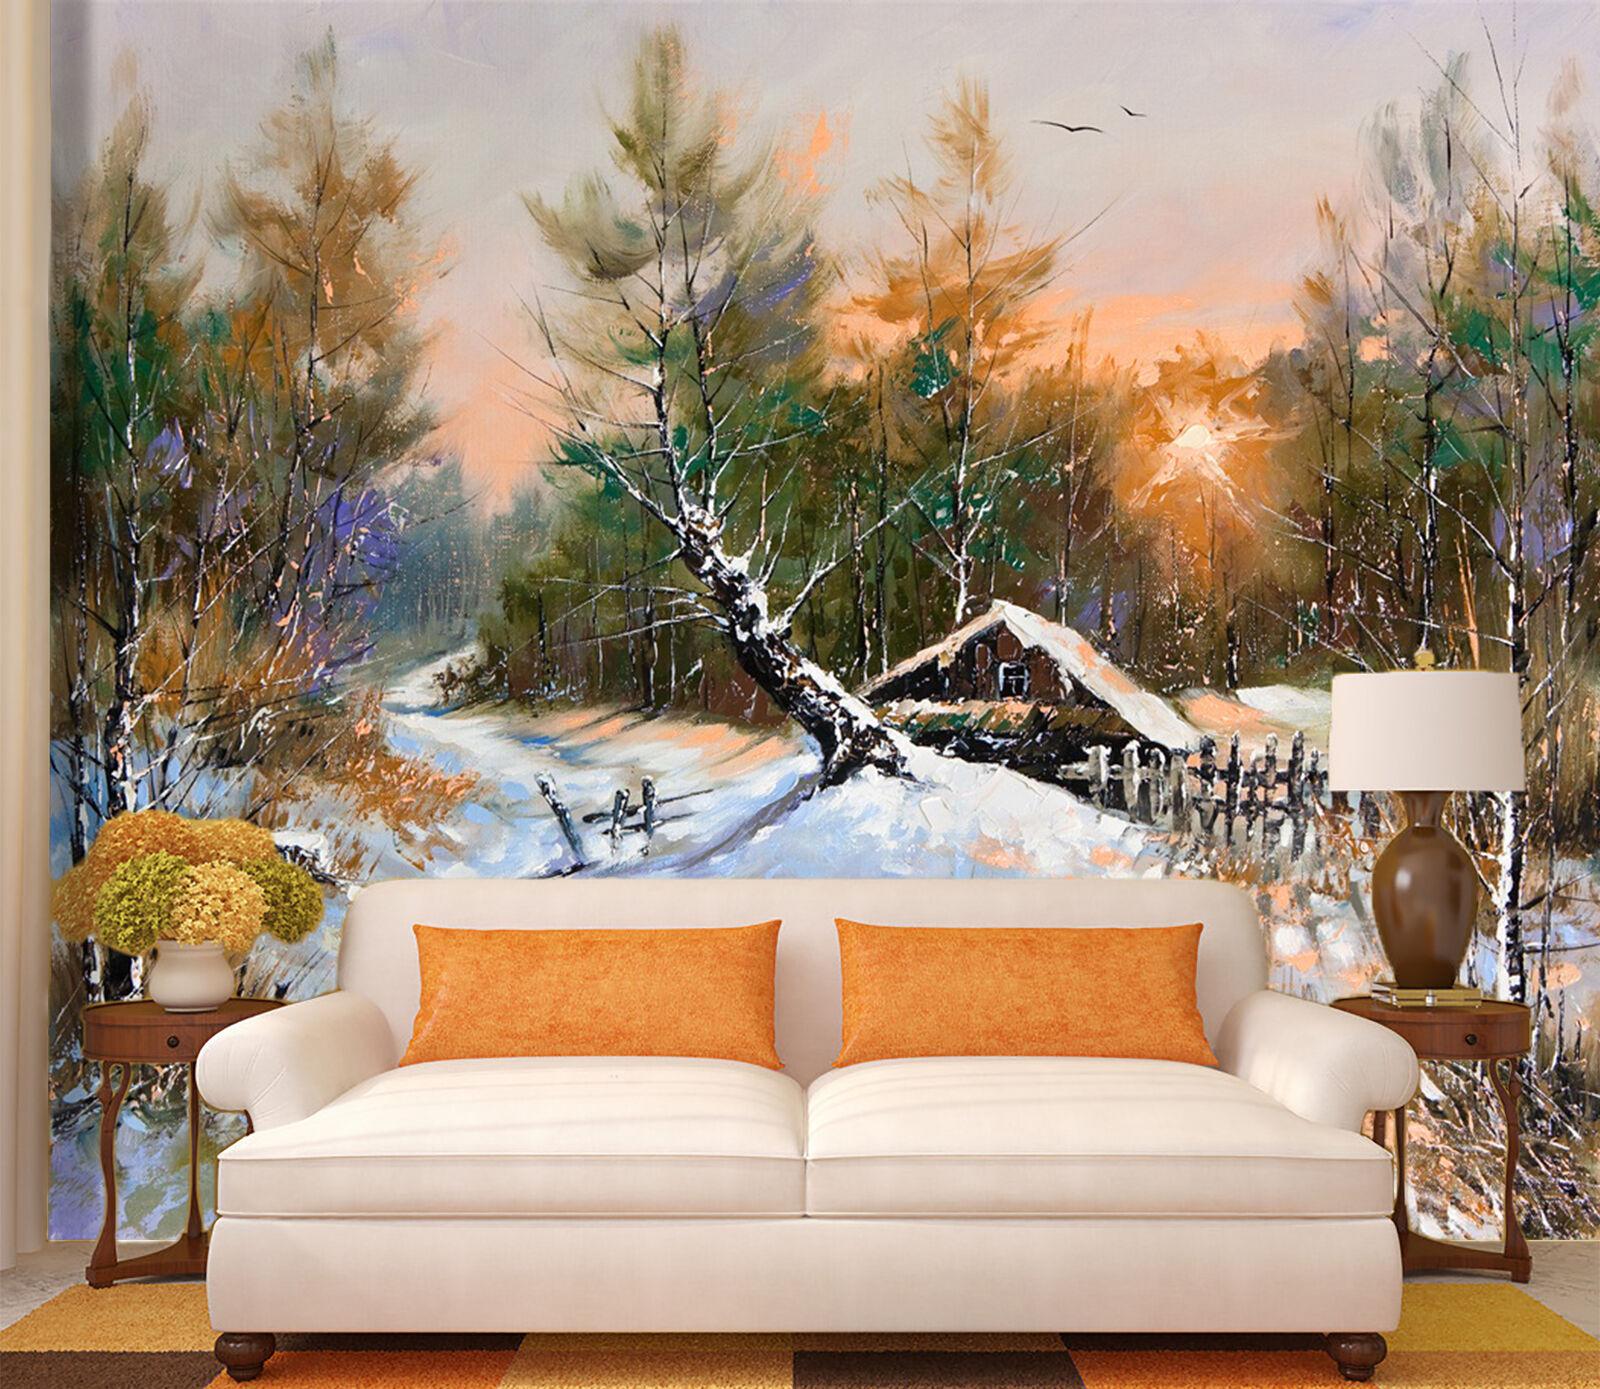 3D Forest Cottage 059 WallPaper Murals Wall Print Decal Wall Deco AJ WALLPAPER